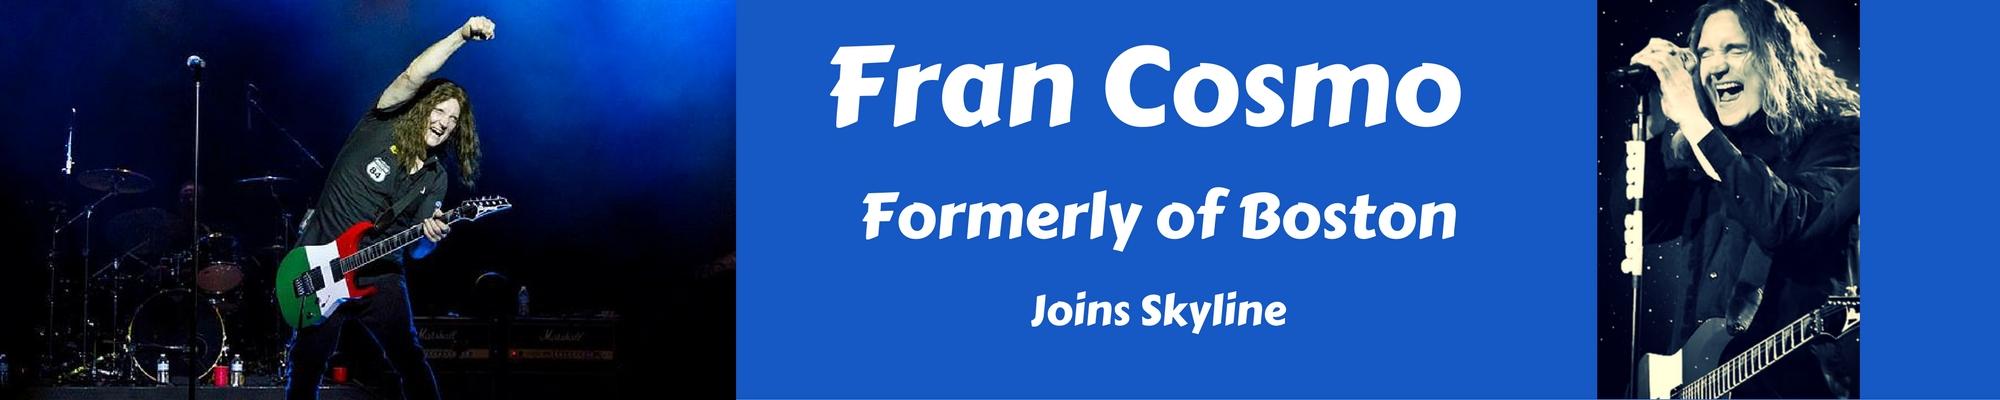 web-banner-fran-cosmo